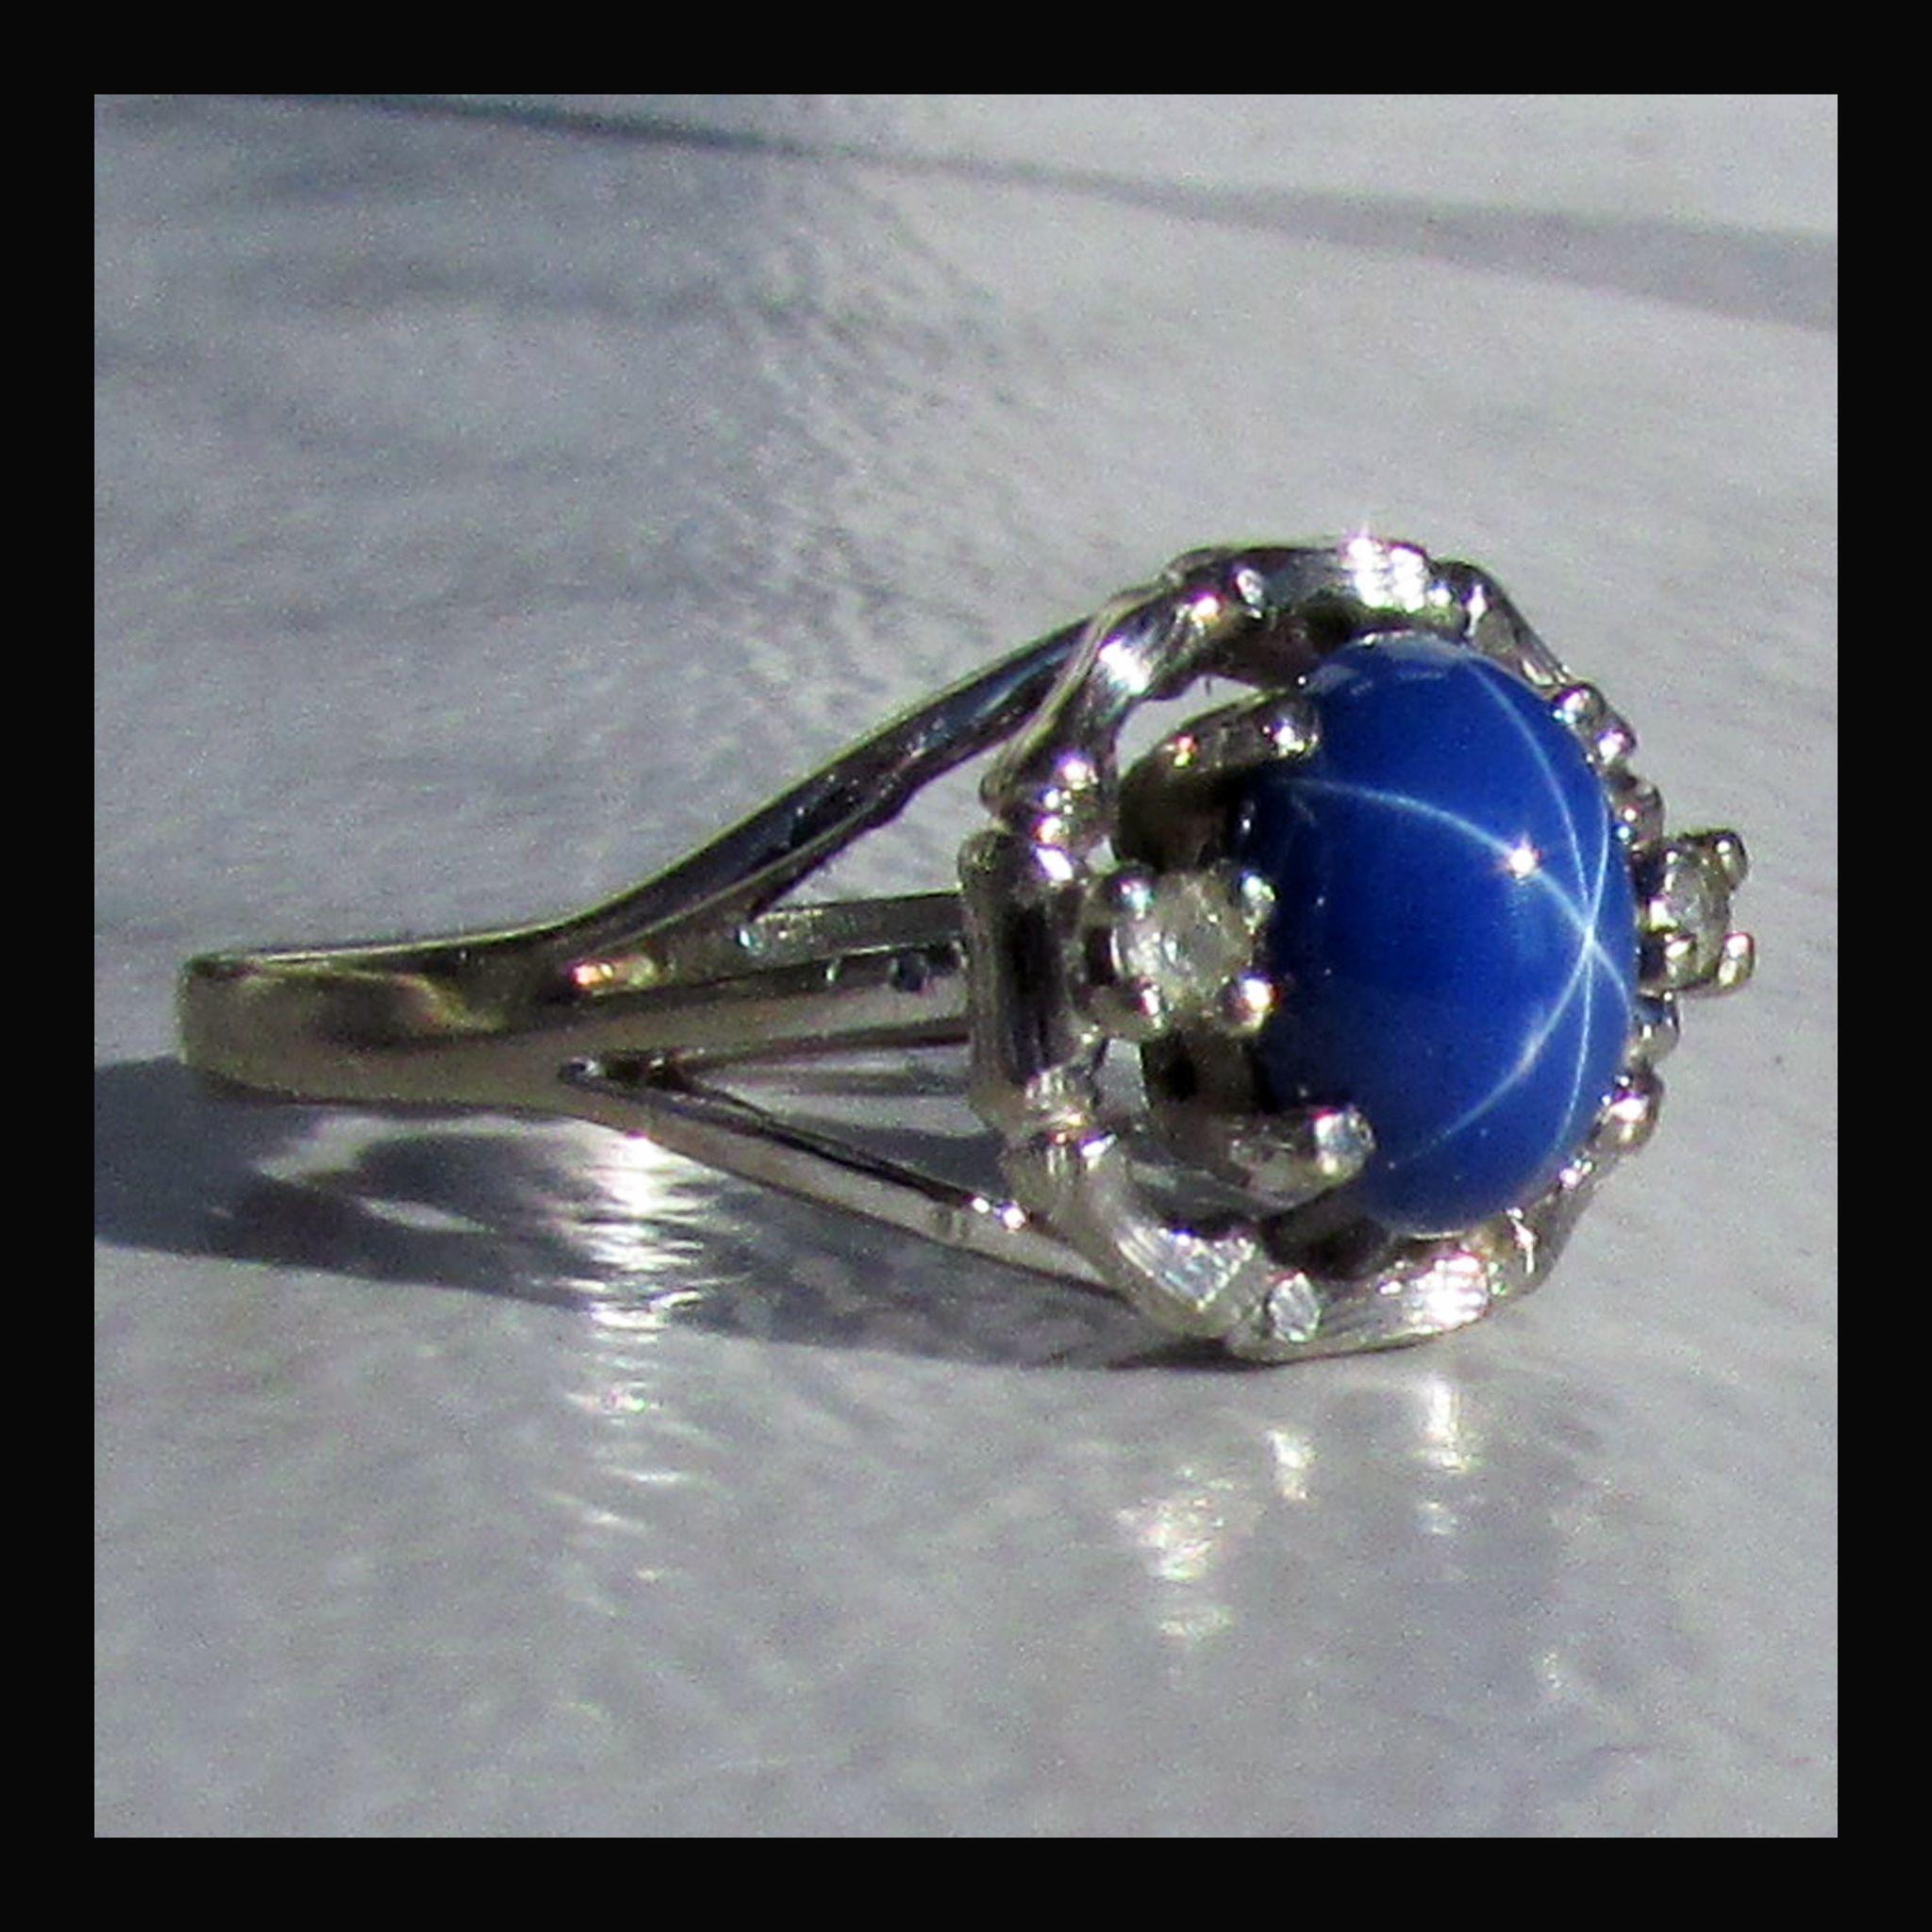 Star Sapphire Engagement Ring 10k wg star sapphire ring,